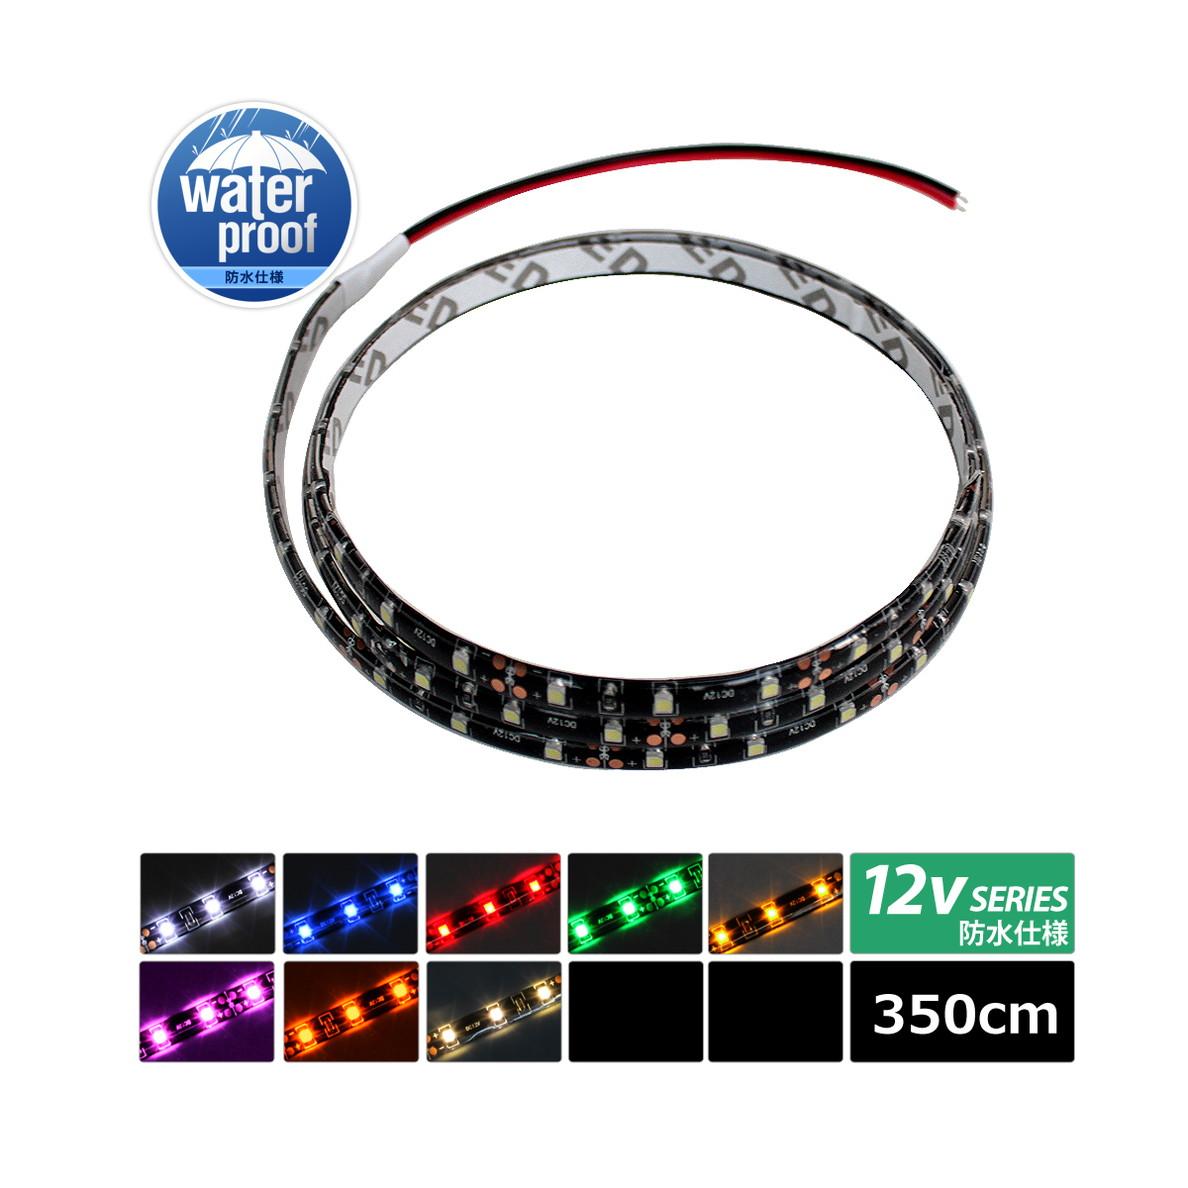 [350cm×1本] 超安12V 防水 LEDテープライト 1チップ 350cm [黒ベース | ケーブル12cm]